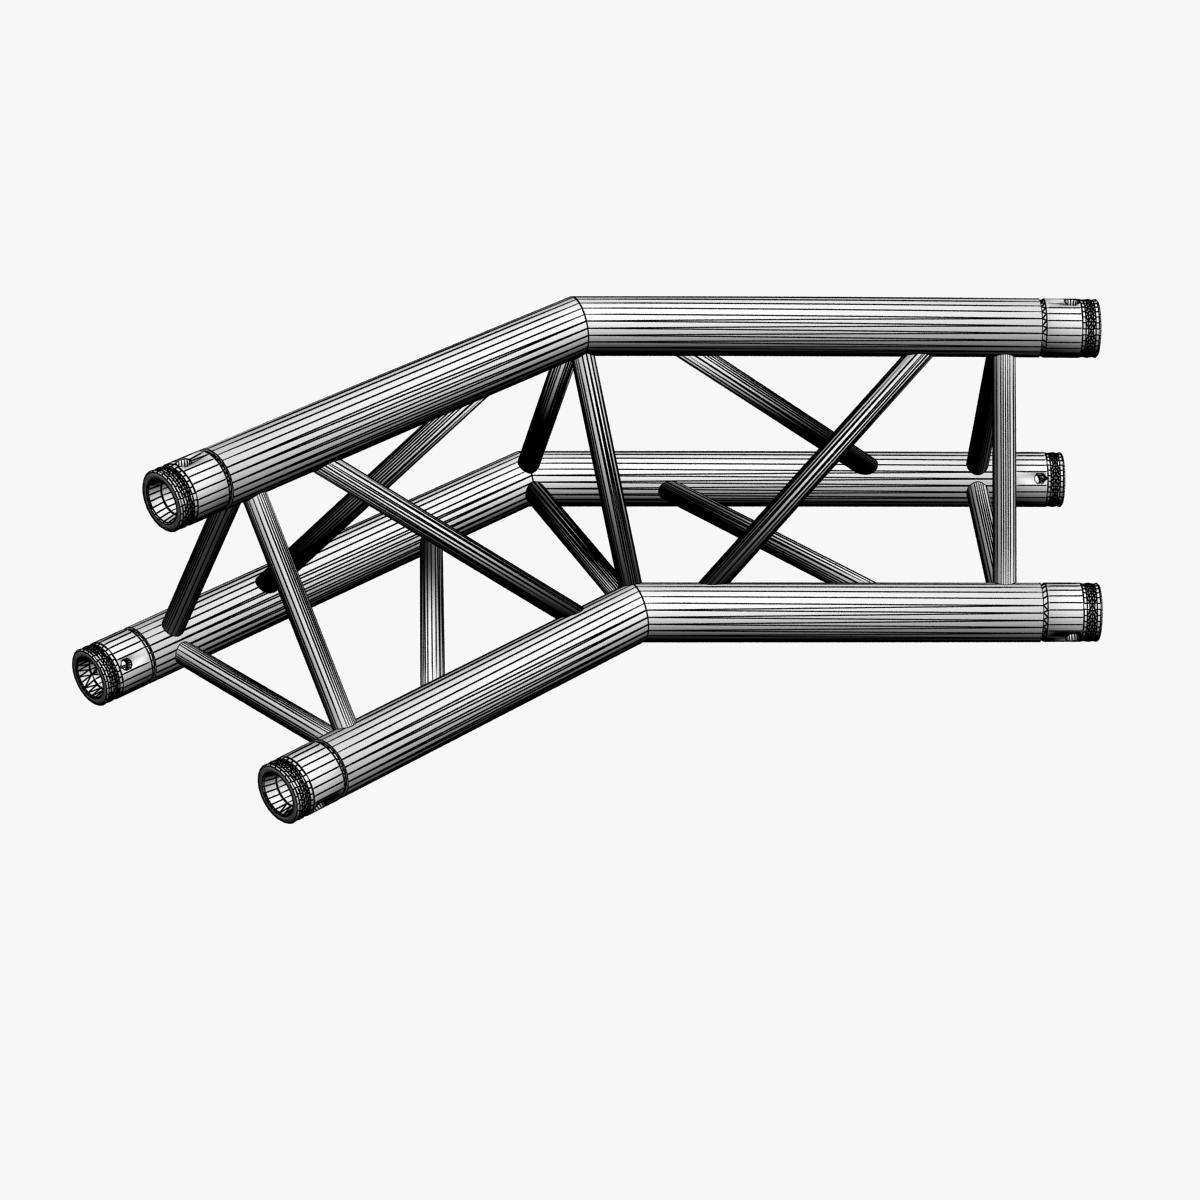 triangular trusses (collection 55 modular pieces) 3d model 3ds max dxf fbx c4d dae texture obj 216236